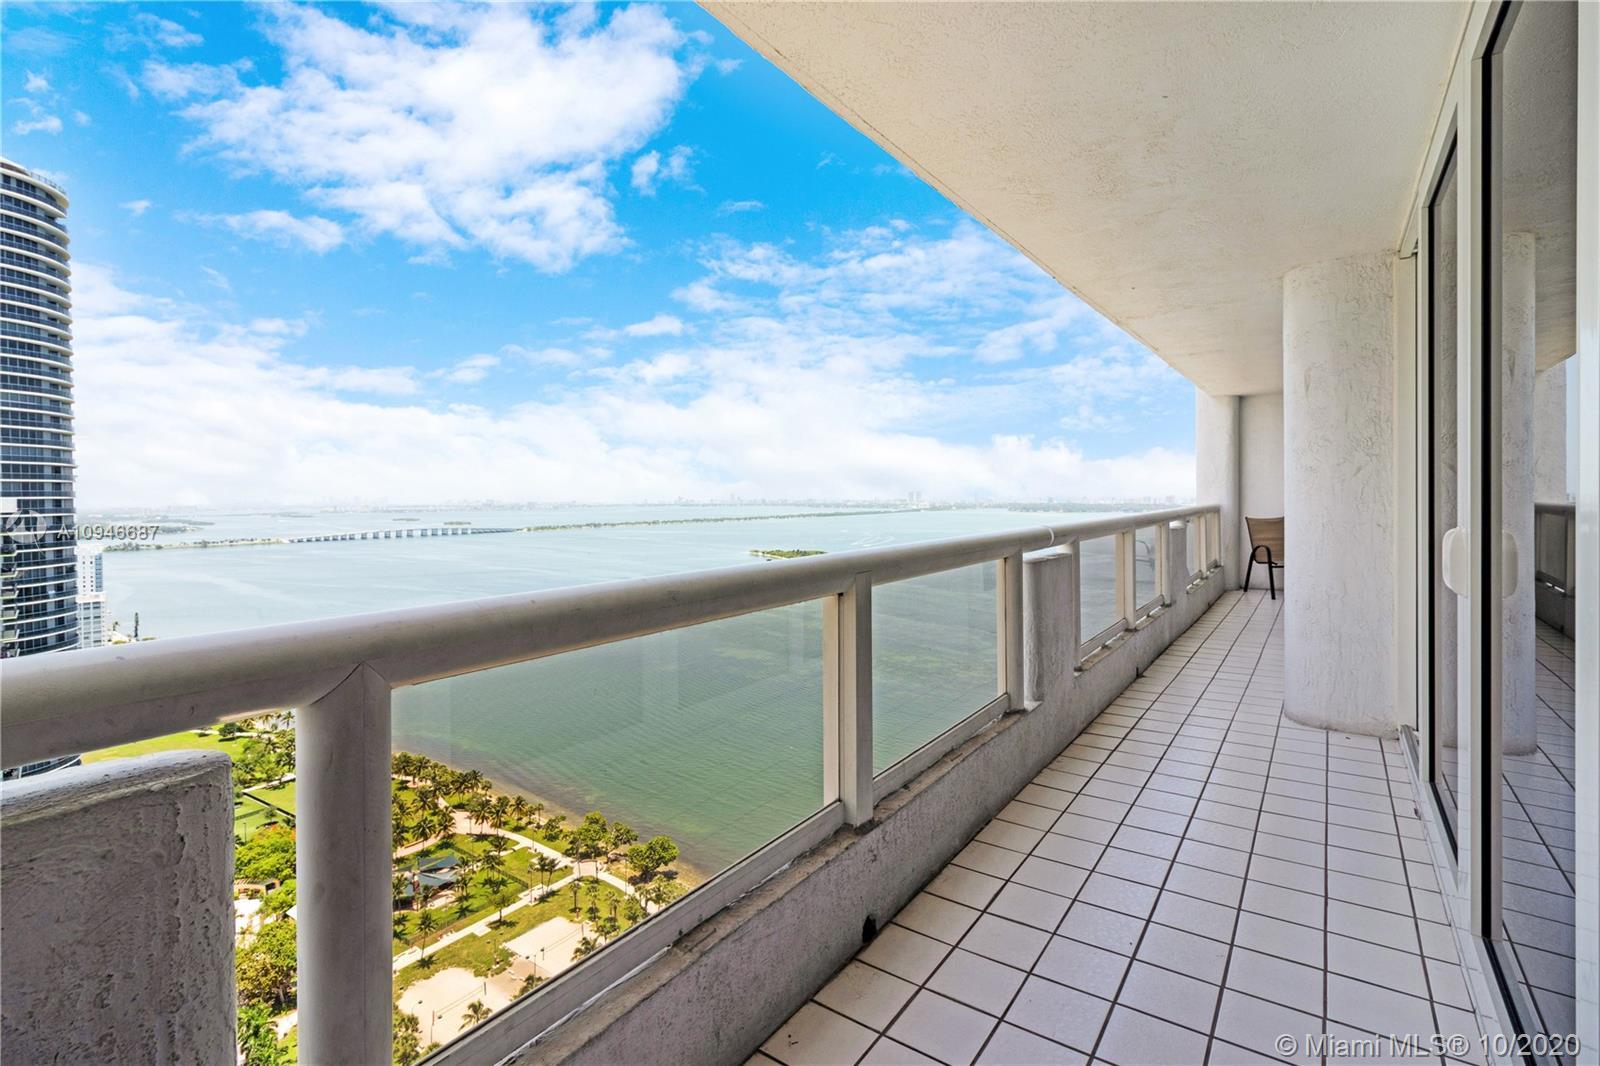 1717 N Bayshore Dr # 4151, Miami, Florida 33132, 4 Bedrooms Bedrooms, ,3 BathroomsBathrooms,Residential,For Sale,1717 N Bayshore Dr # 4151,A10946687